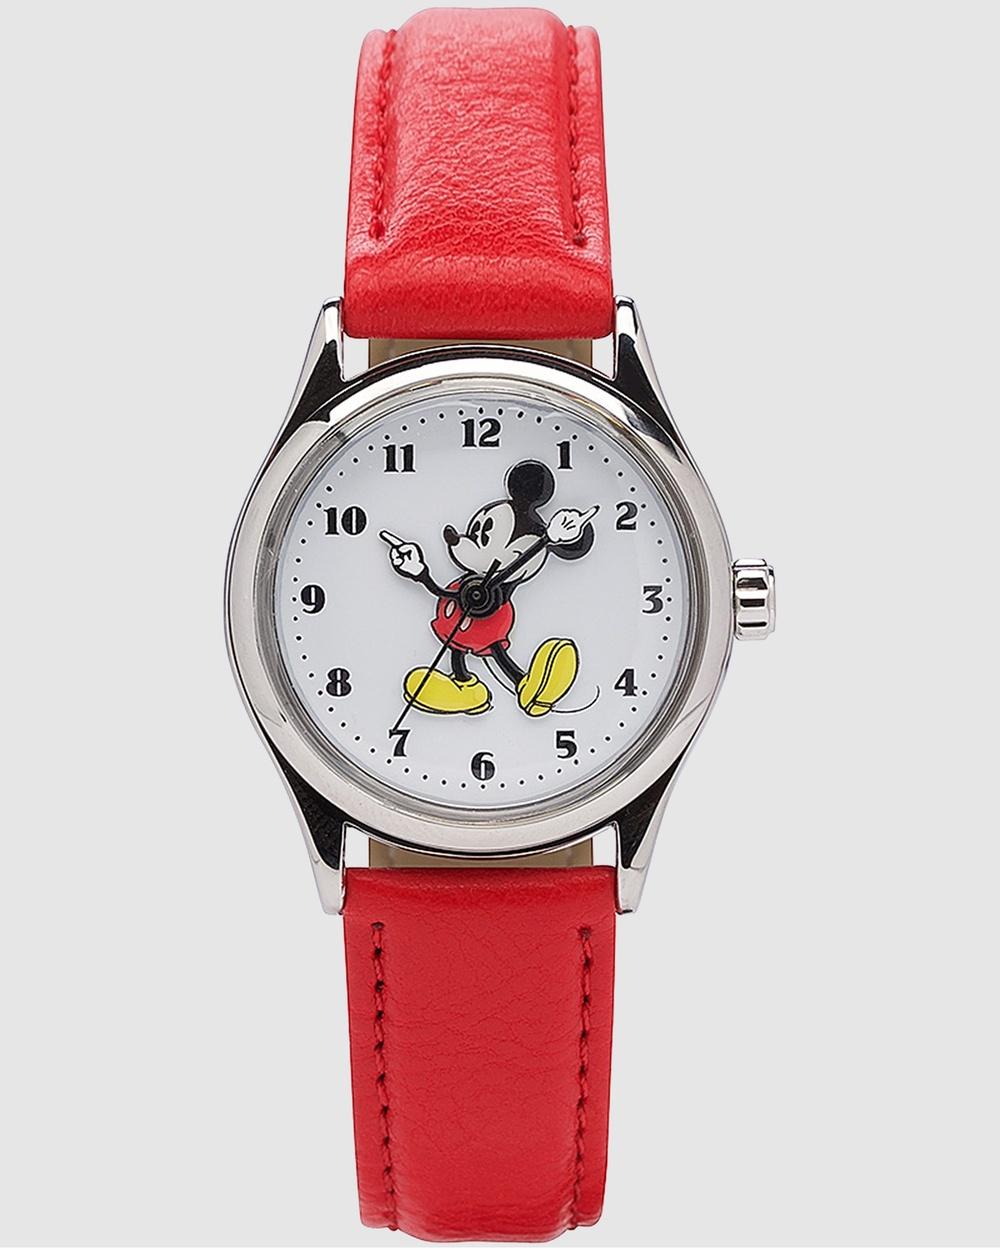 Disney Original Mickey Red Watch Watches Red